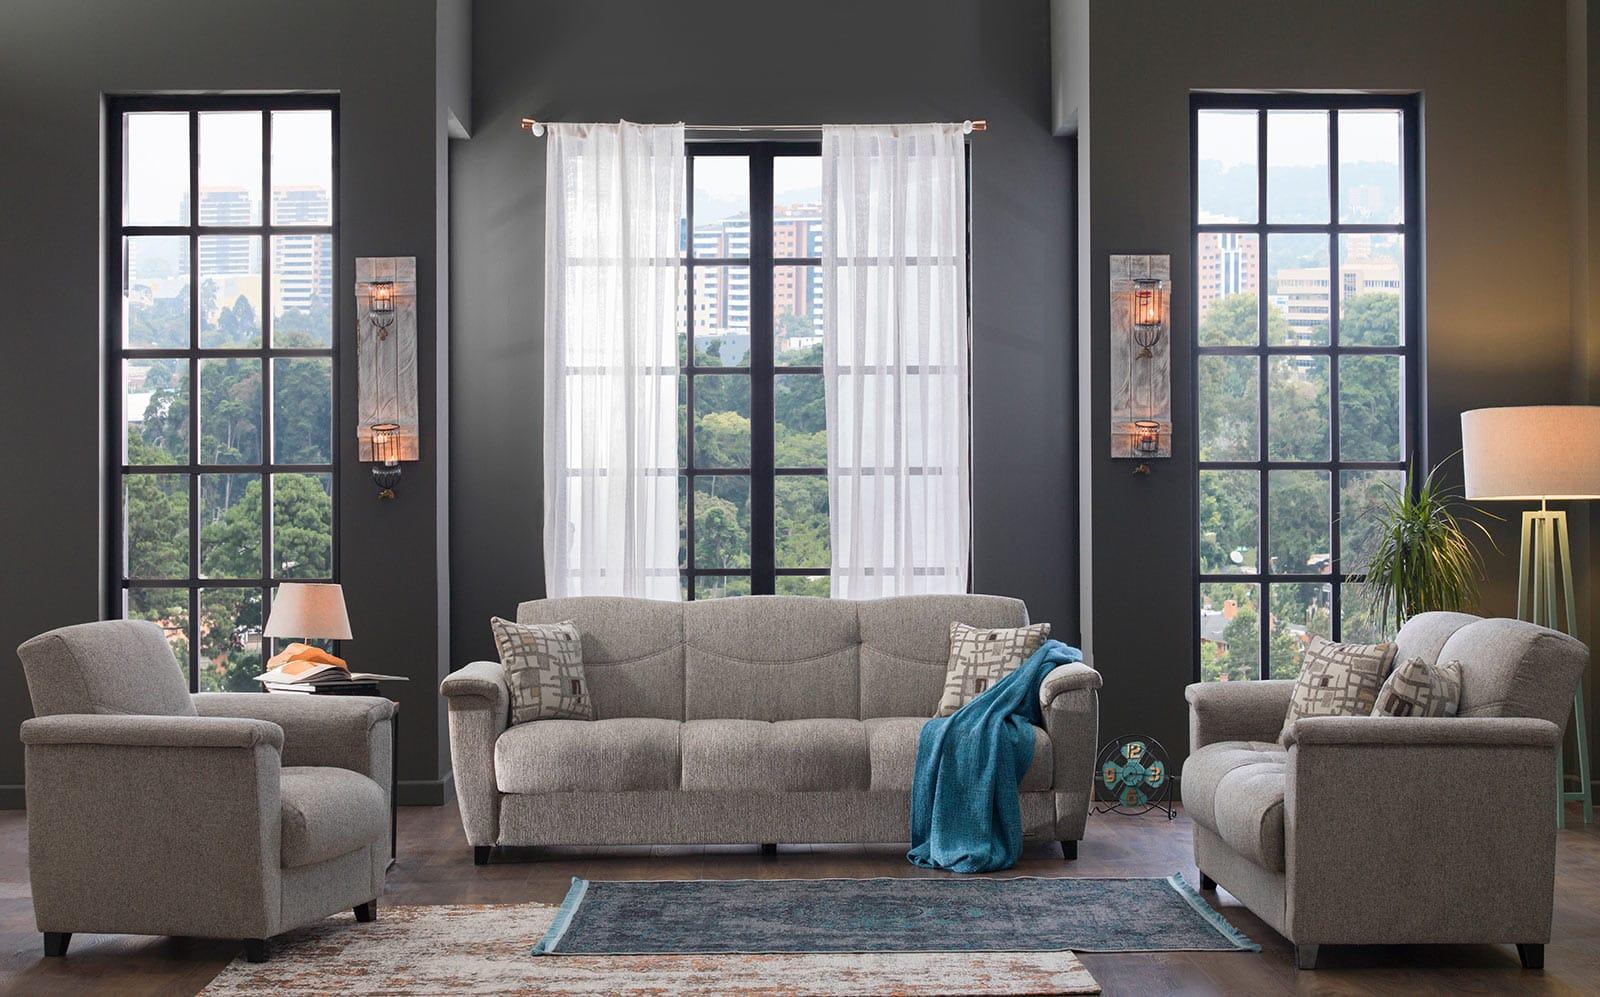 Aspen Aristo Light Brown Sofa Love